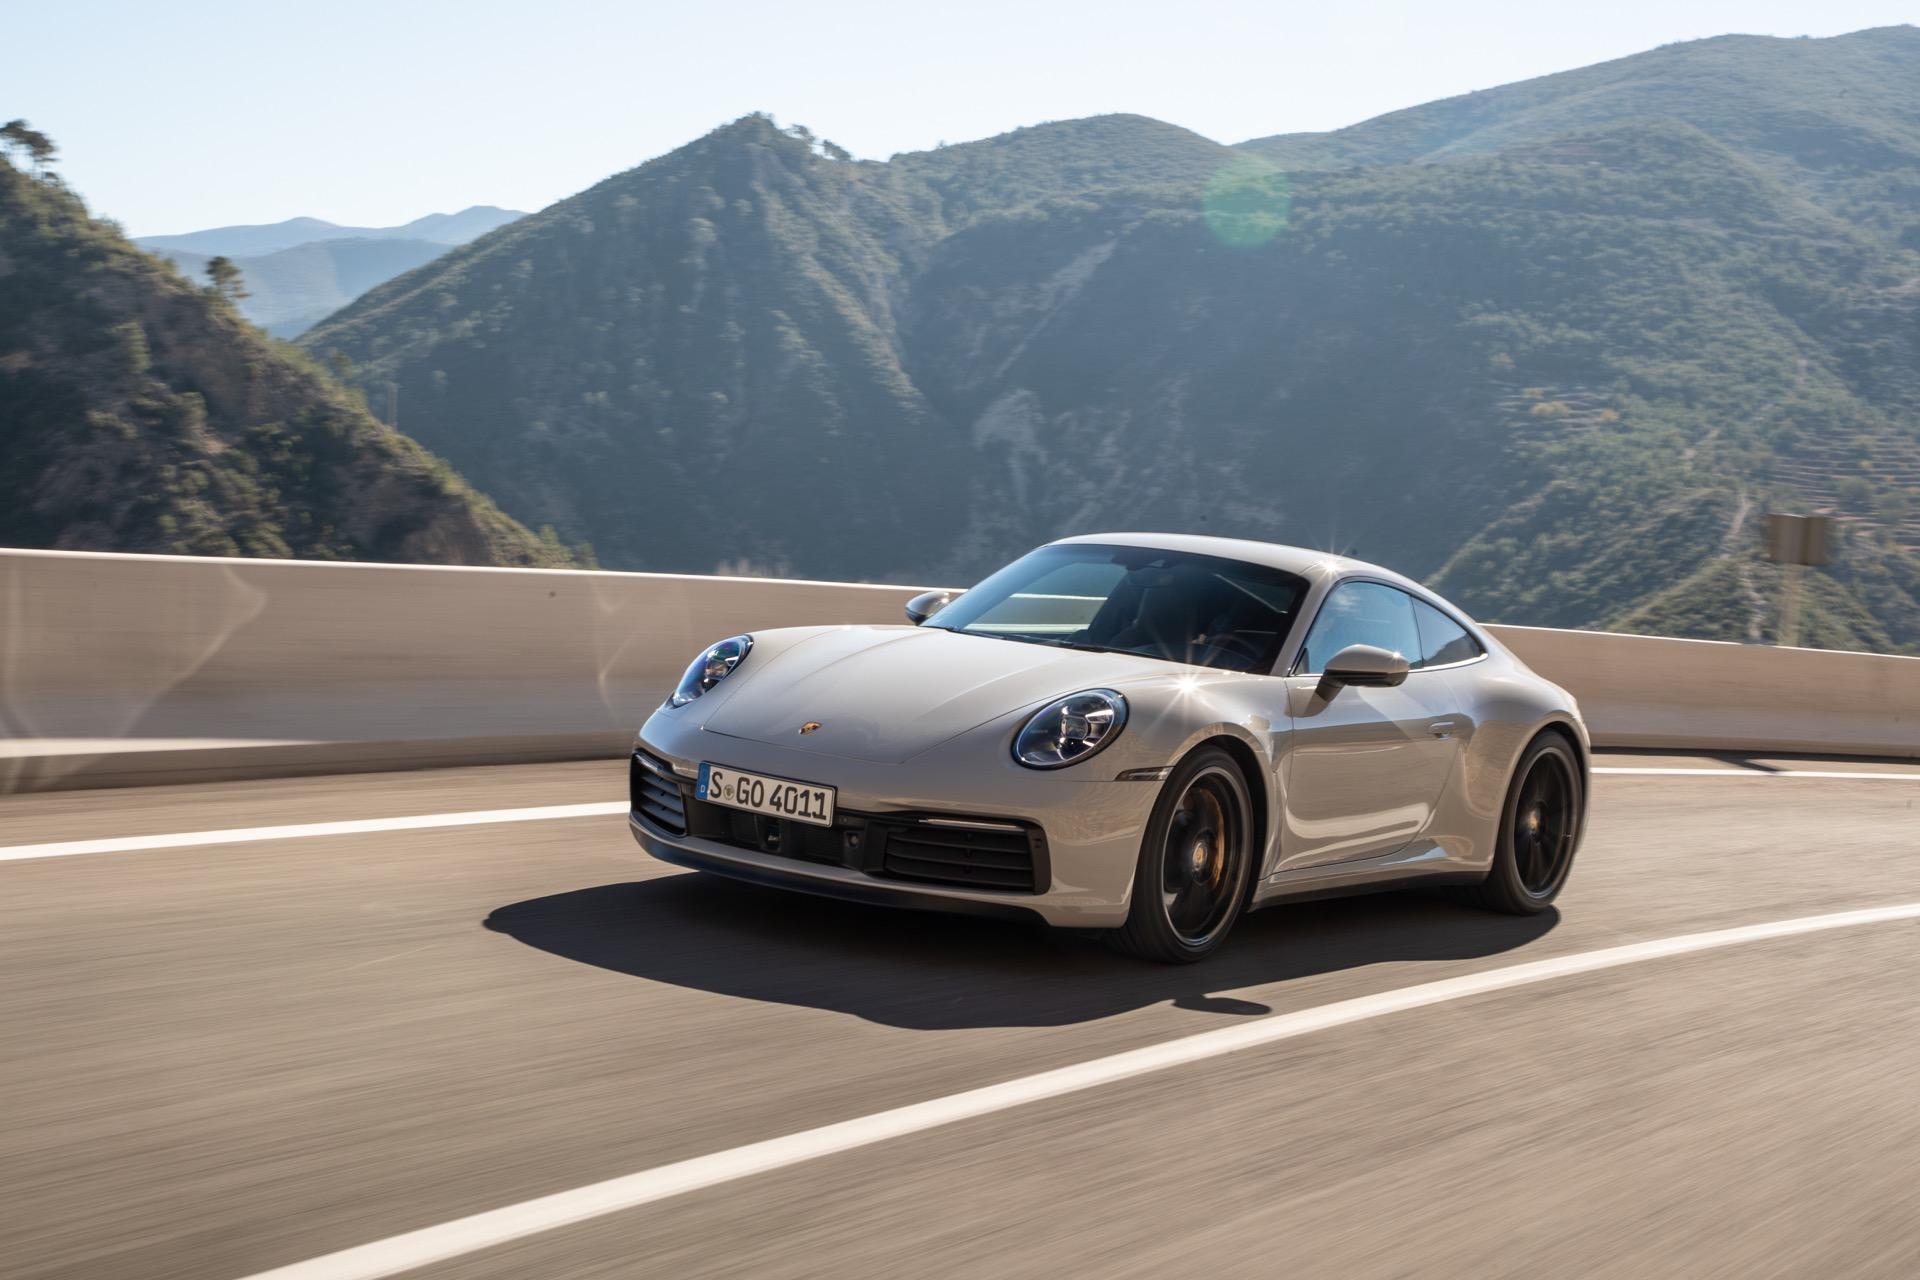 Porsche 911 992 Carrera S 00008